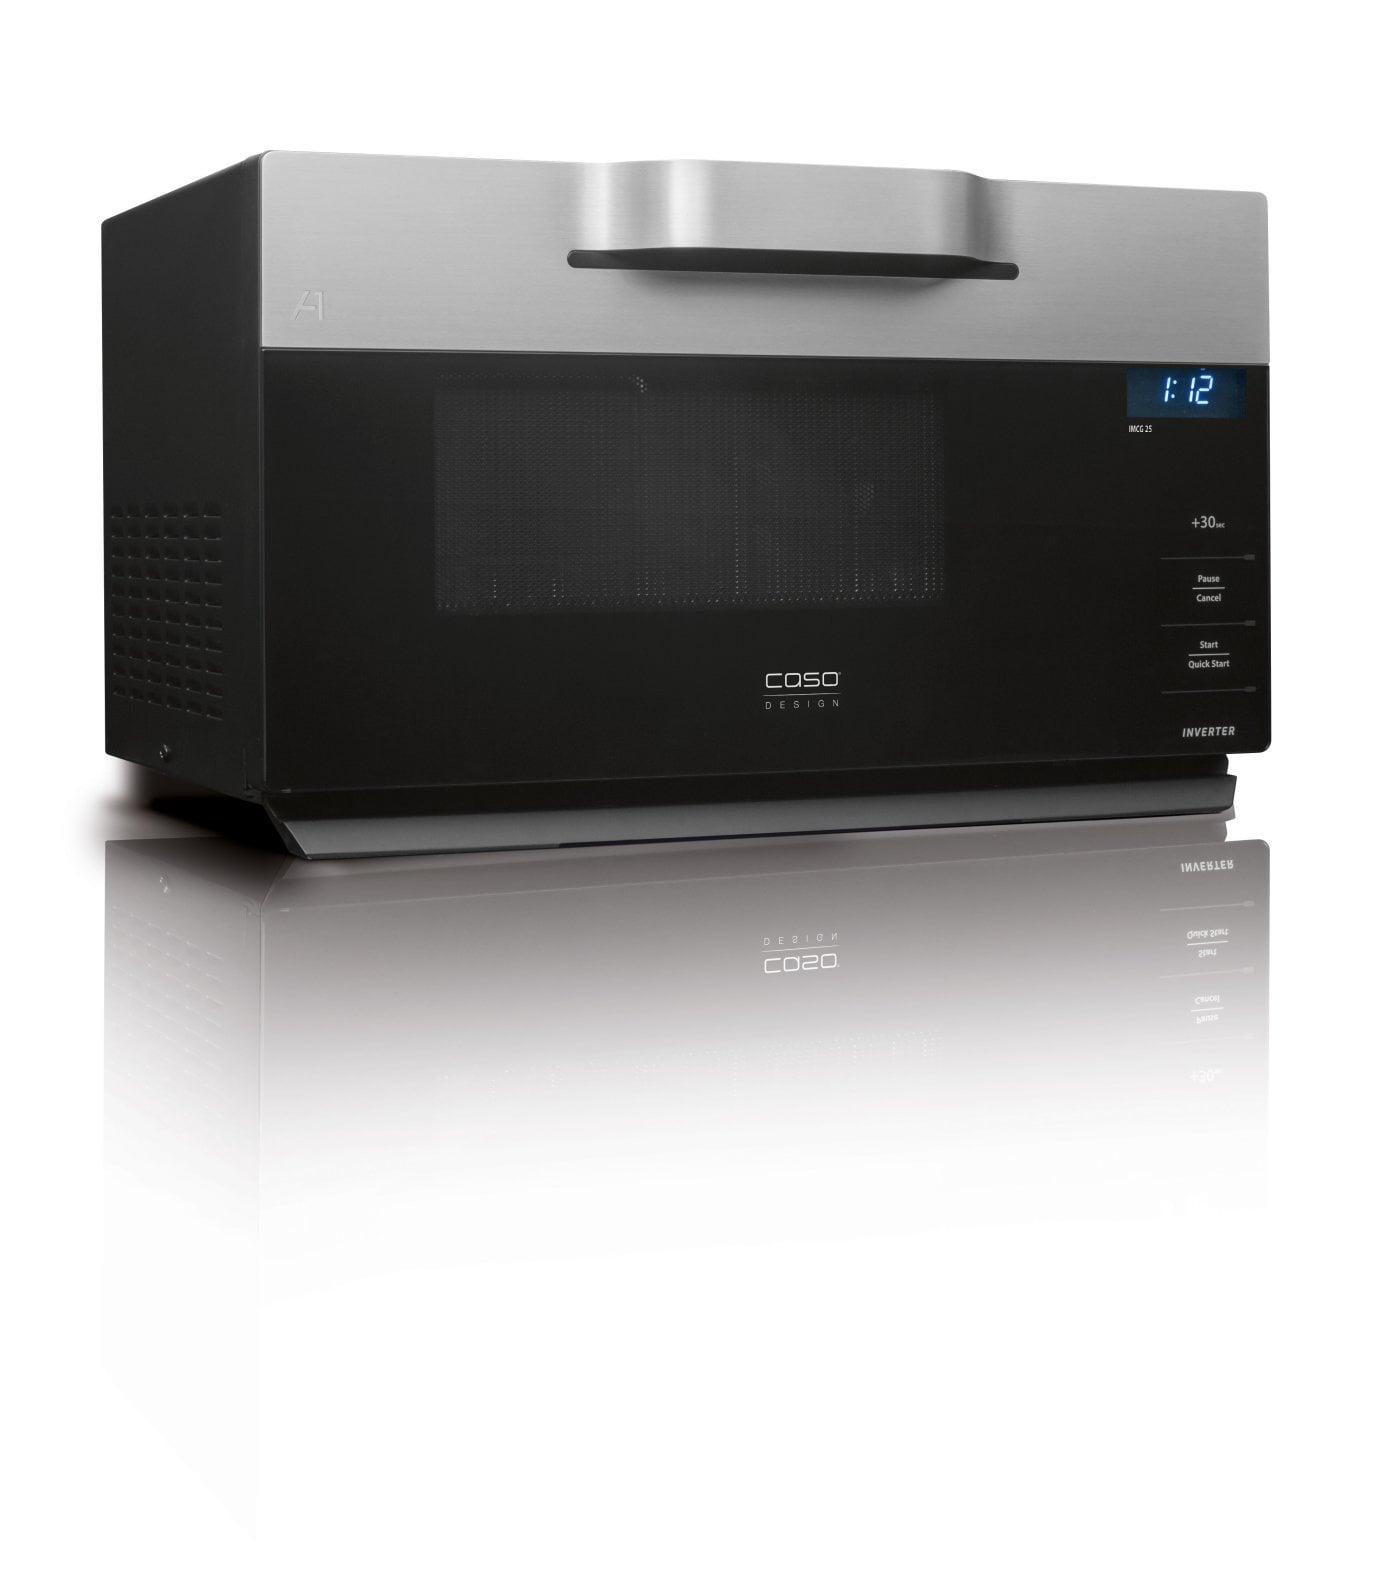 CASO IMCG 25 Inverter Mikrowelle + Heißluft + Grill